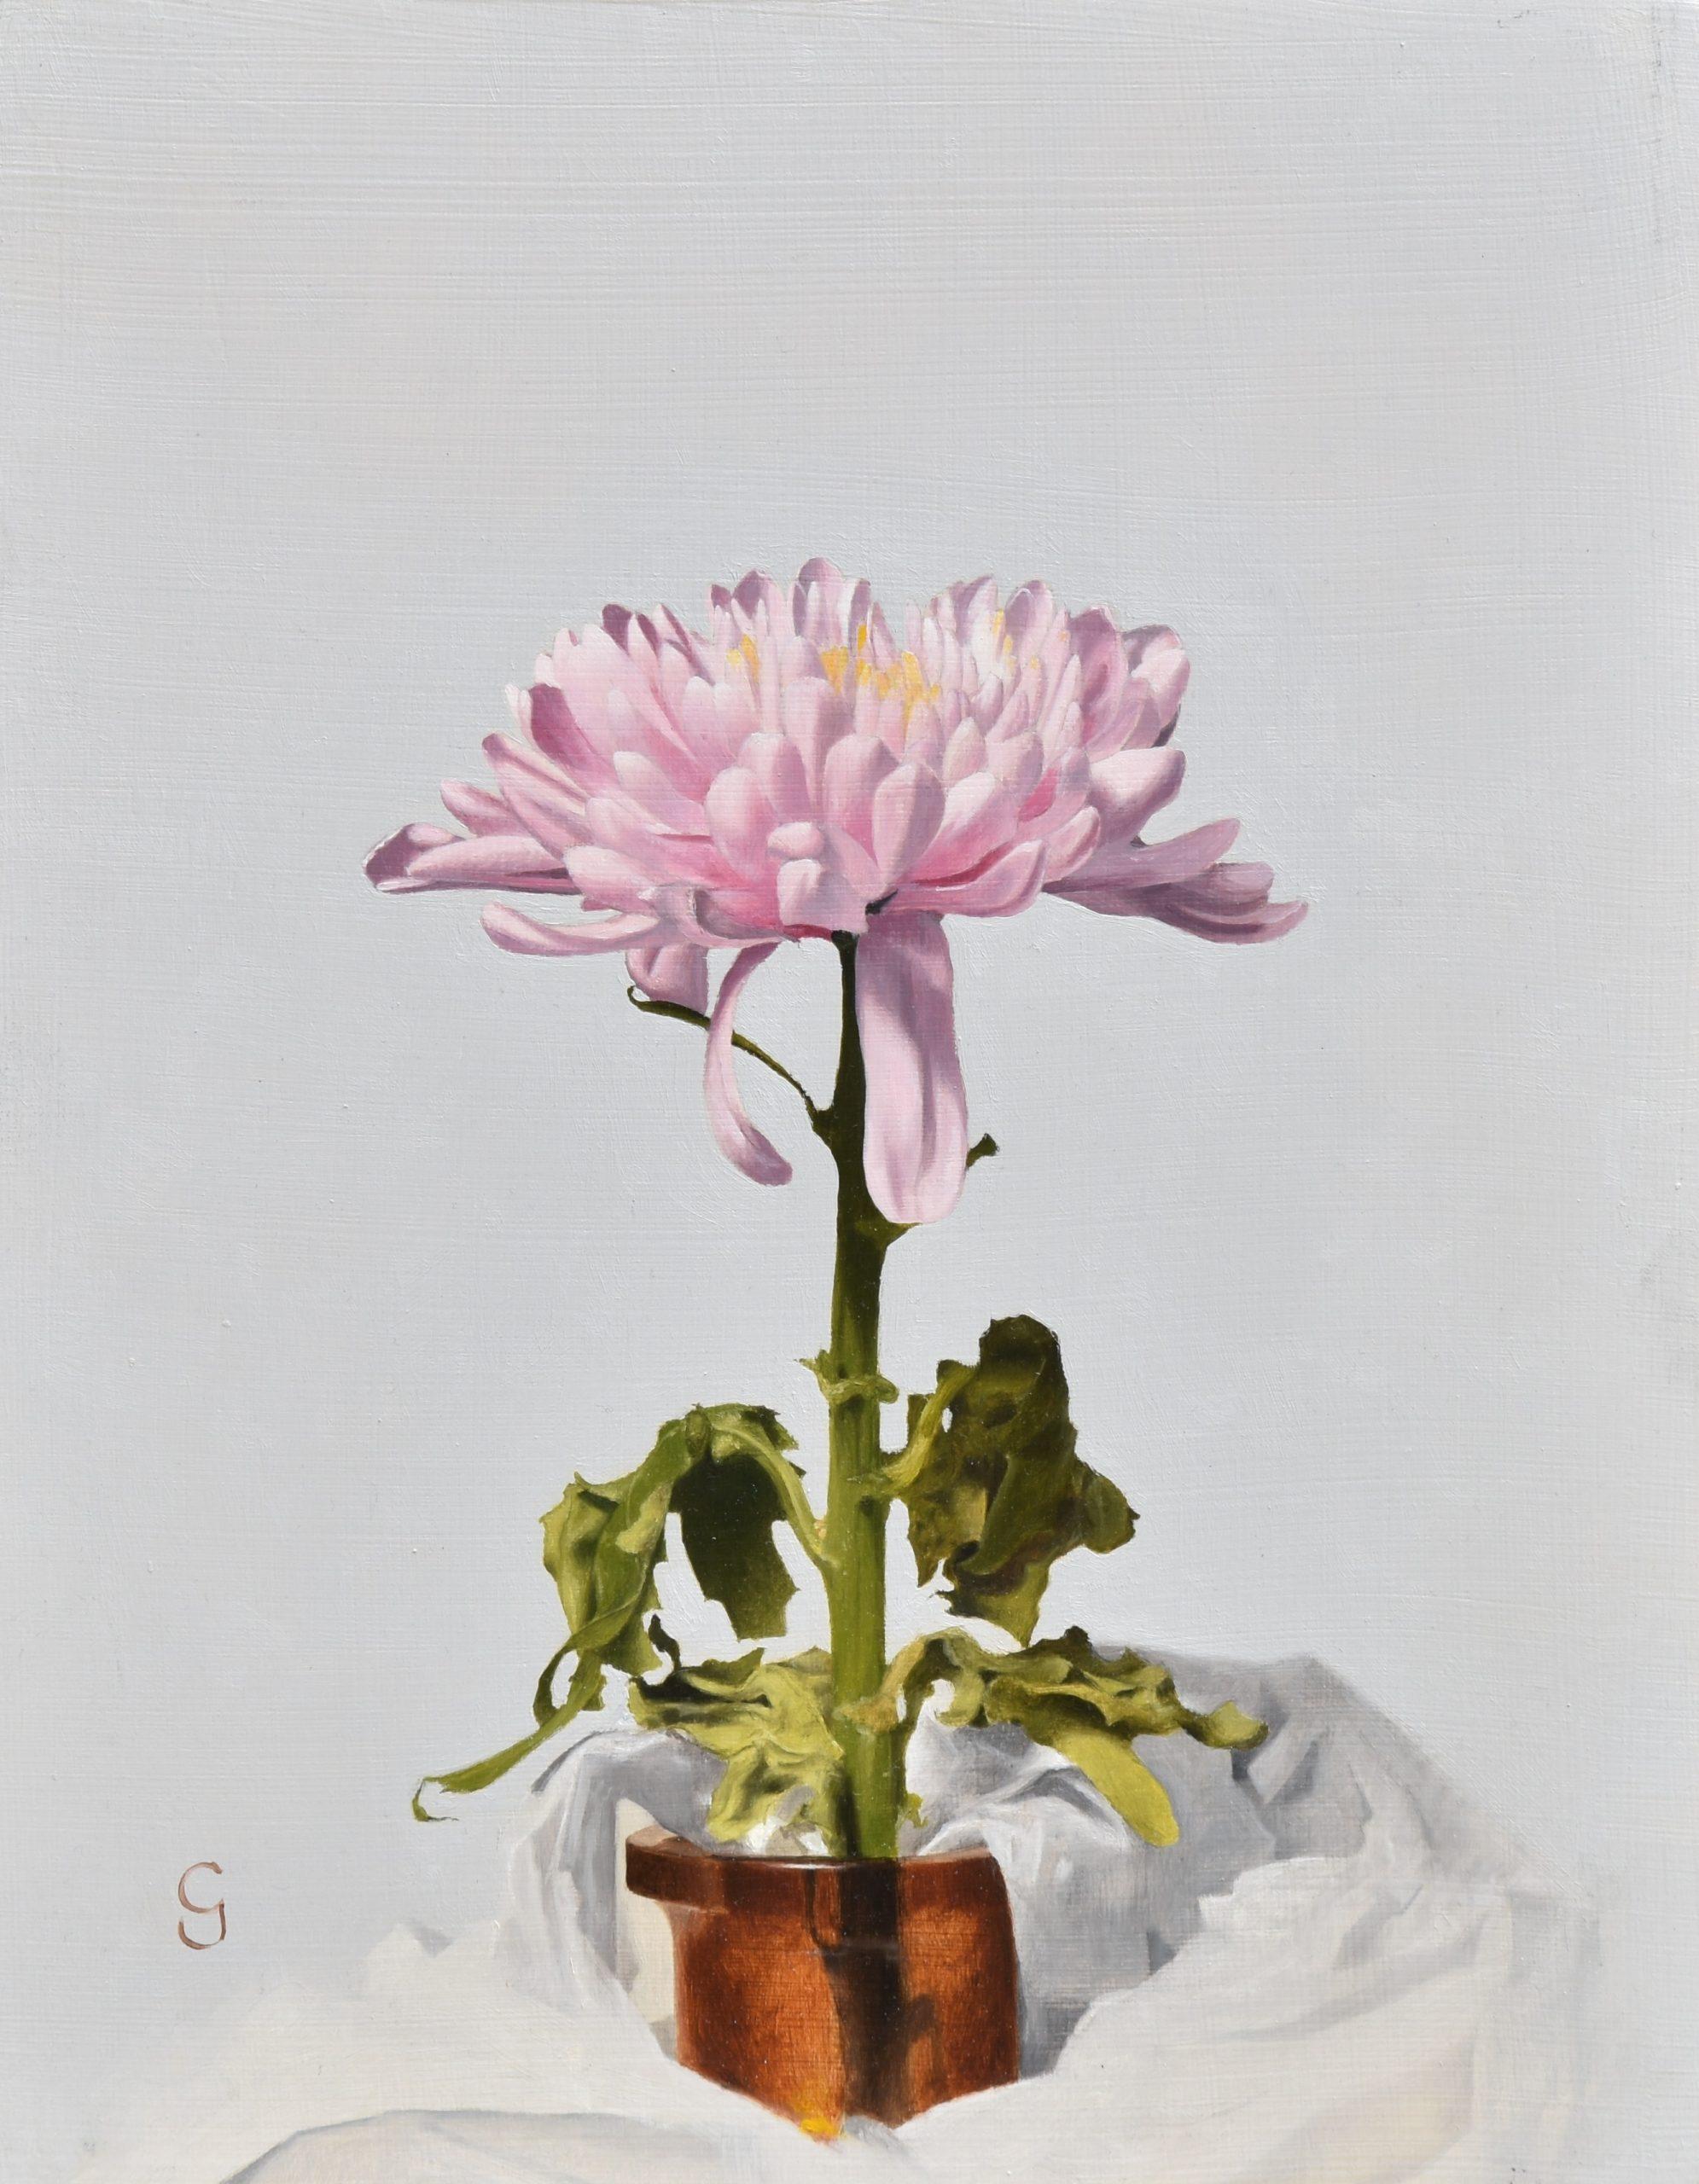 Chrysanthemum, 14″ x 11″, Oil on Panel